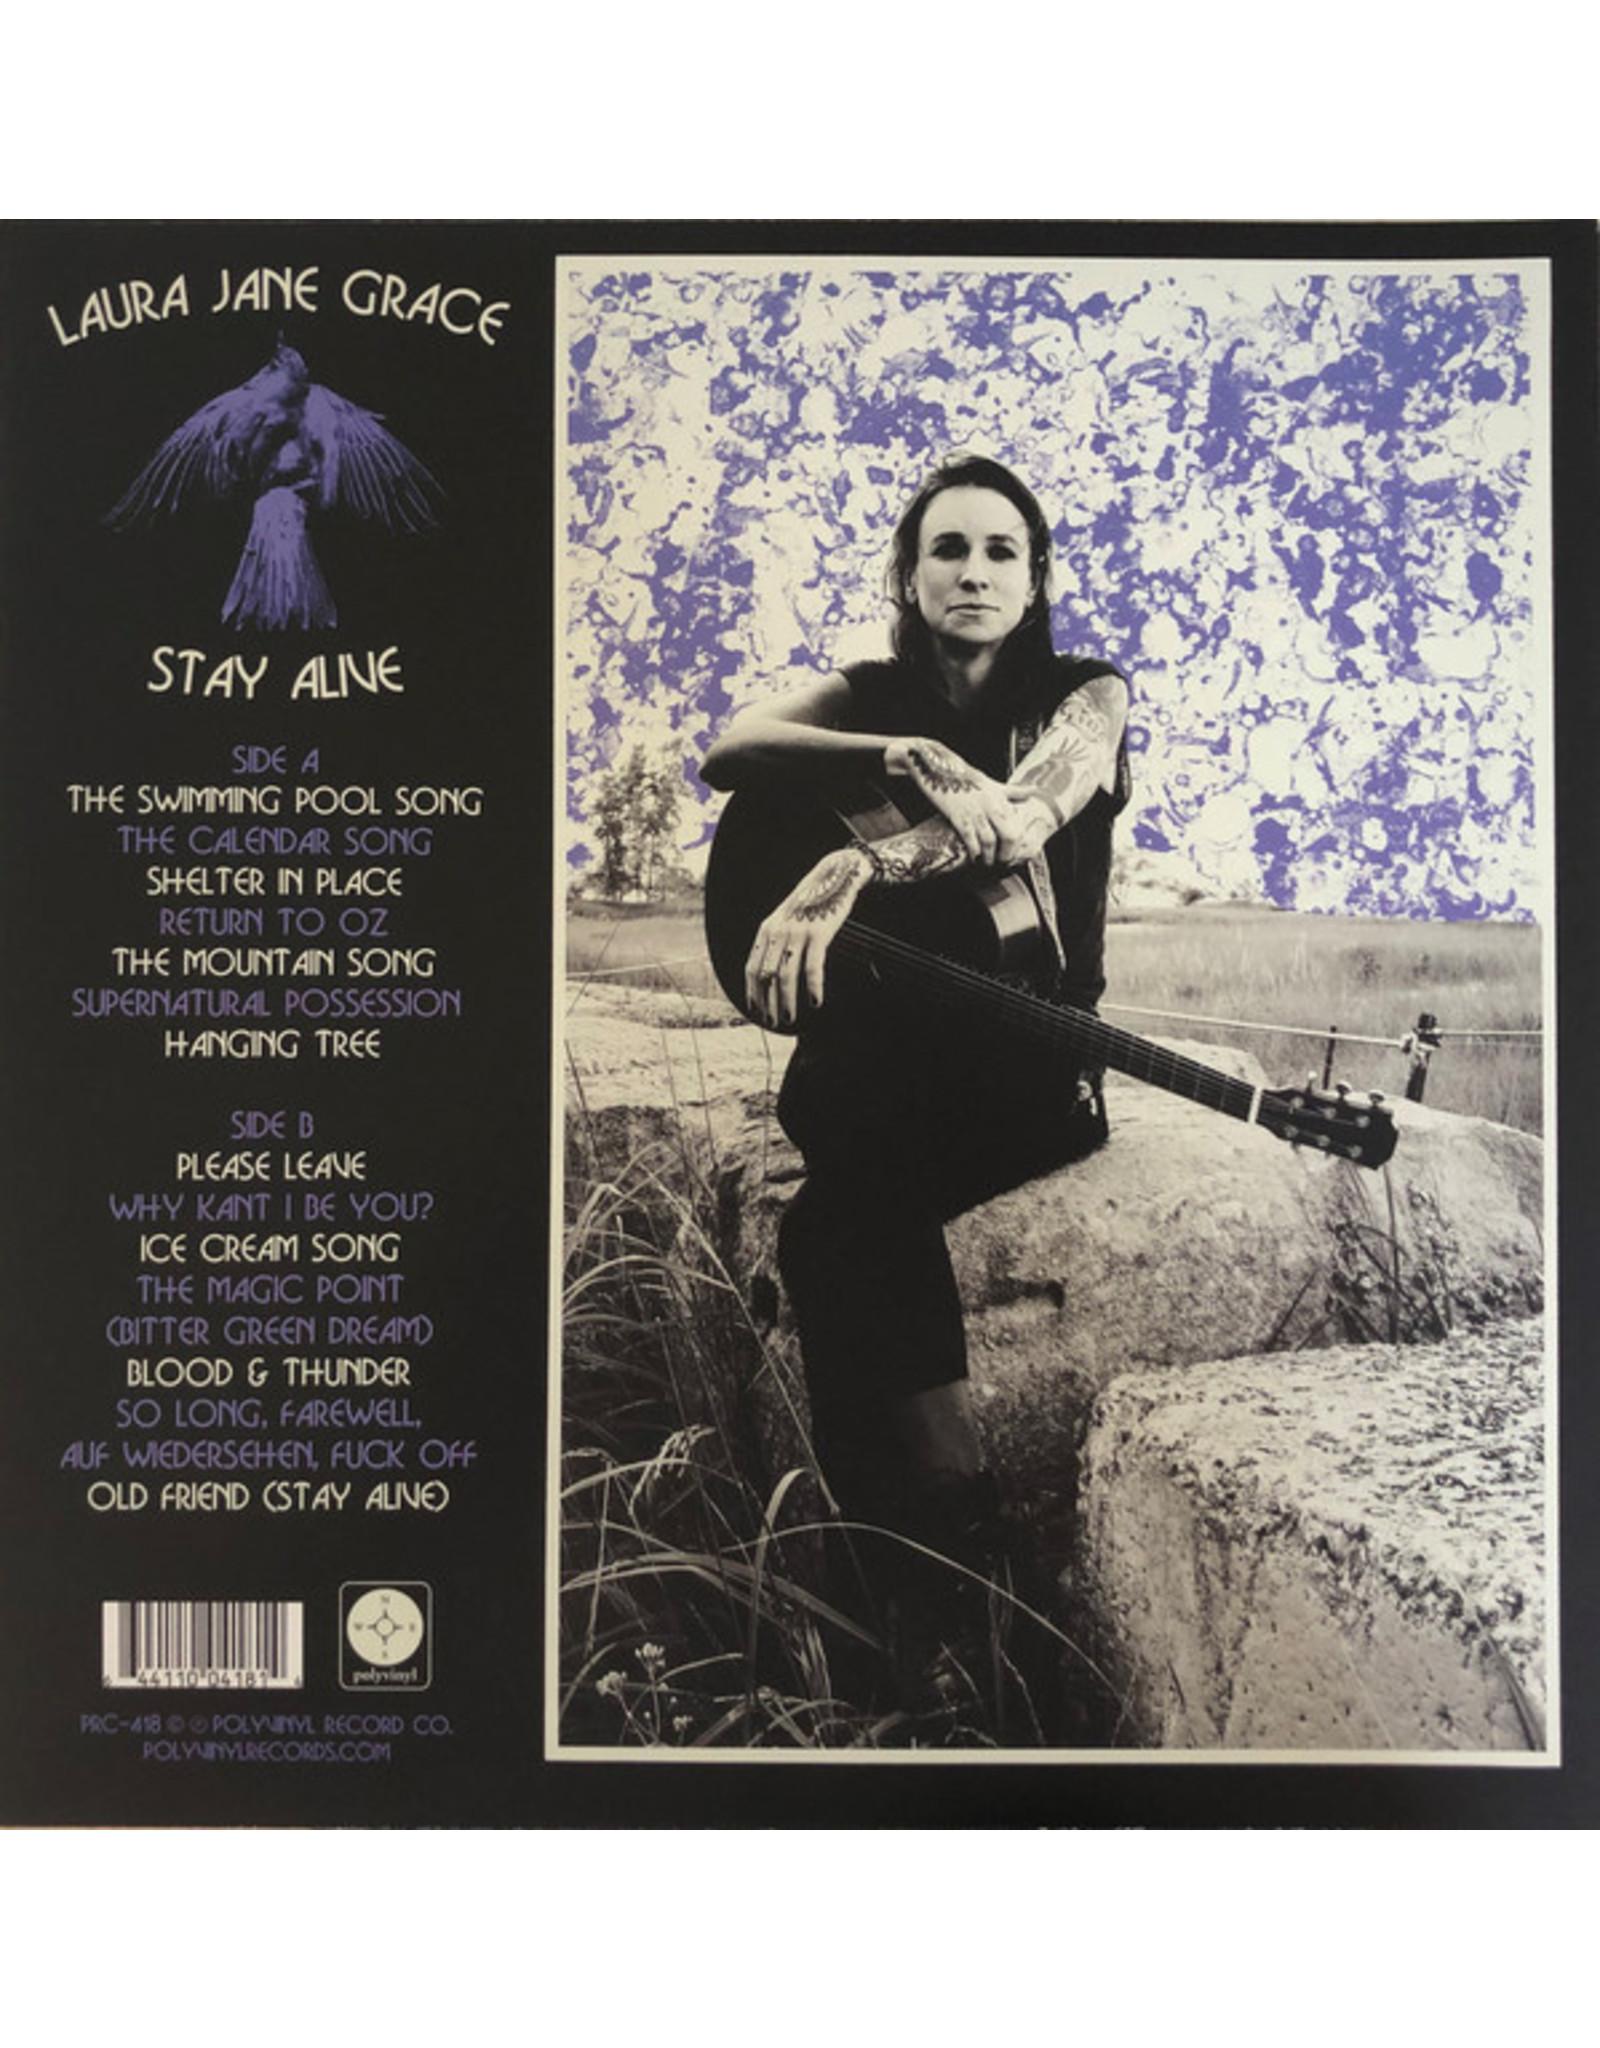 Laura Jane Grace - Stay Alive (Lapis Lazuli Blue Vinyl)